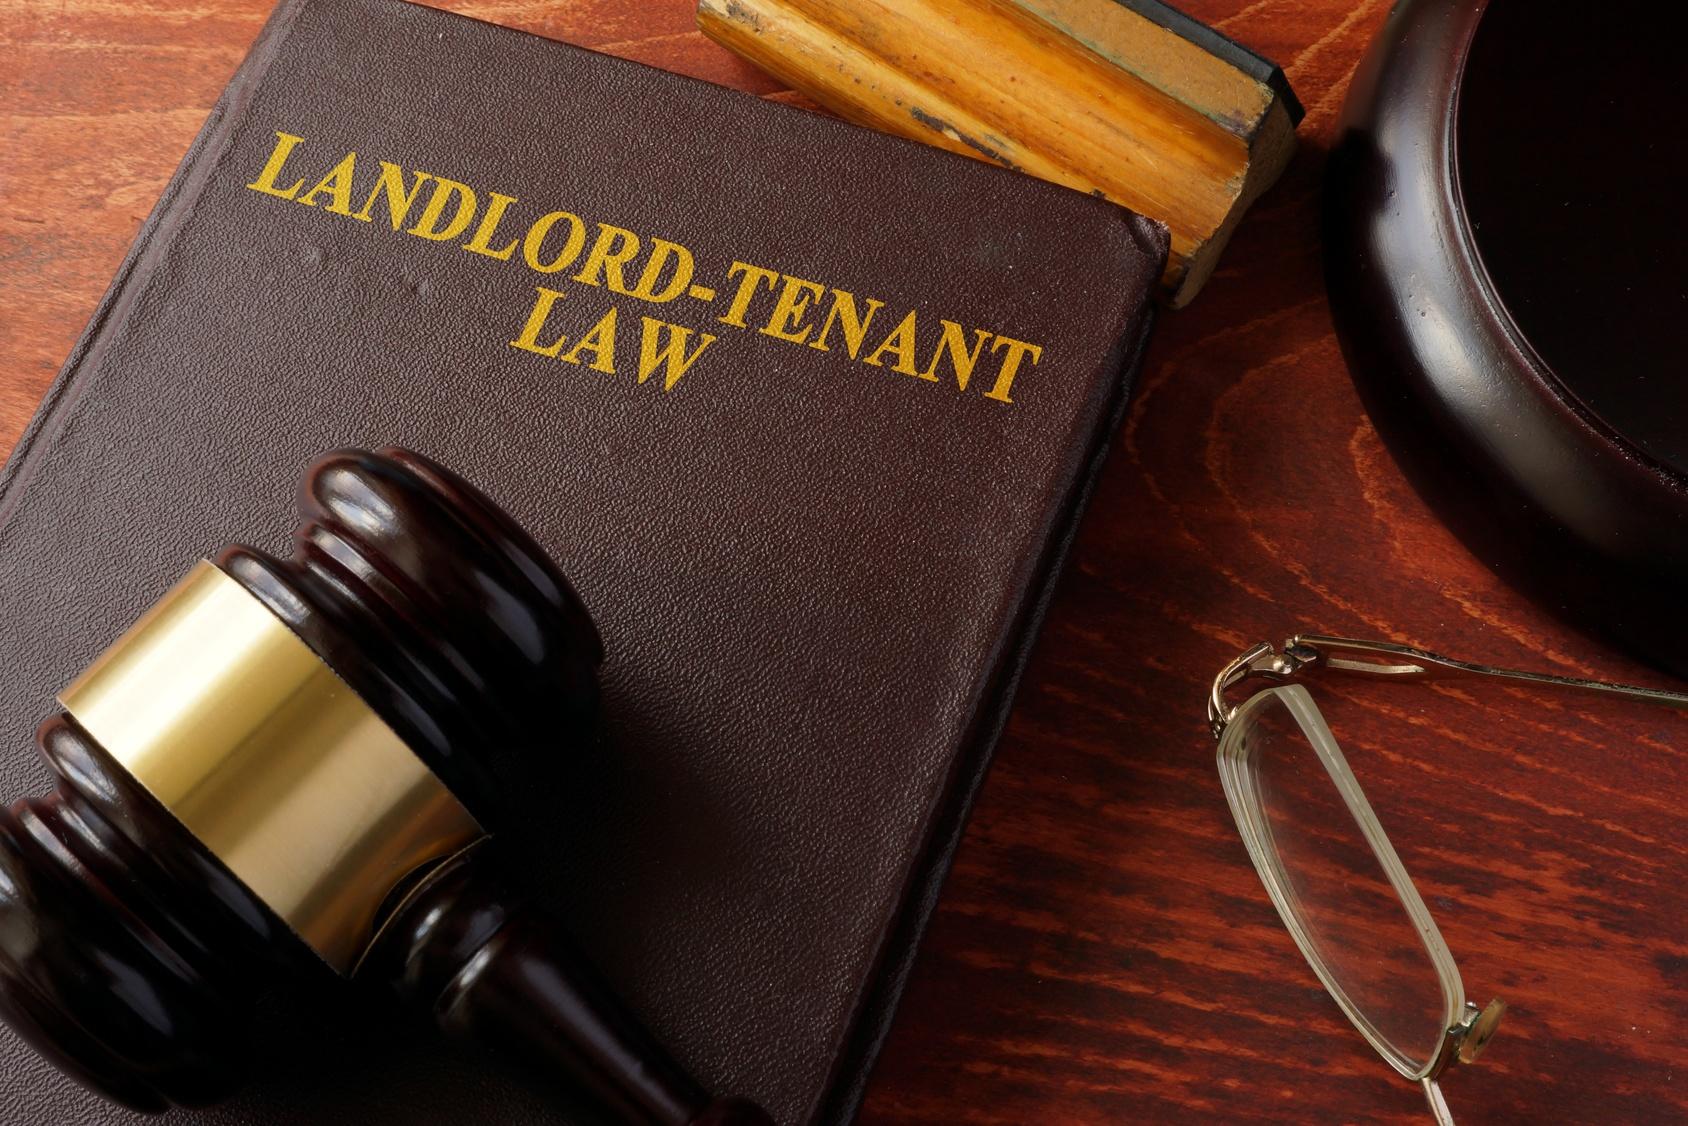 landlord-property-management.jpg